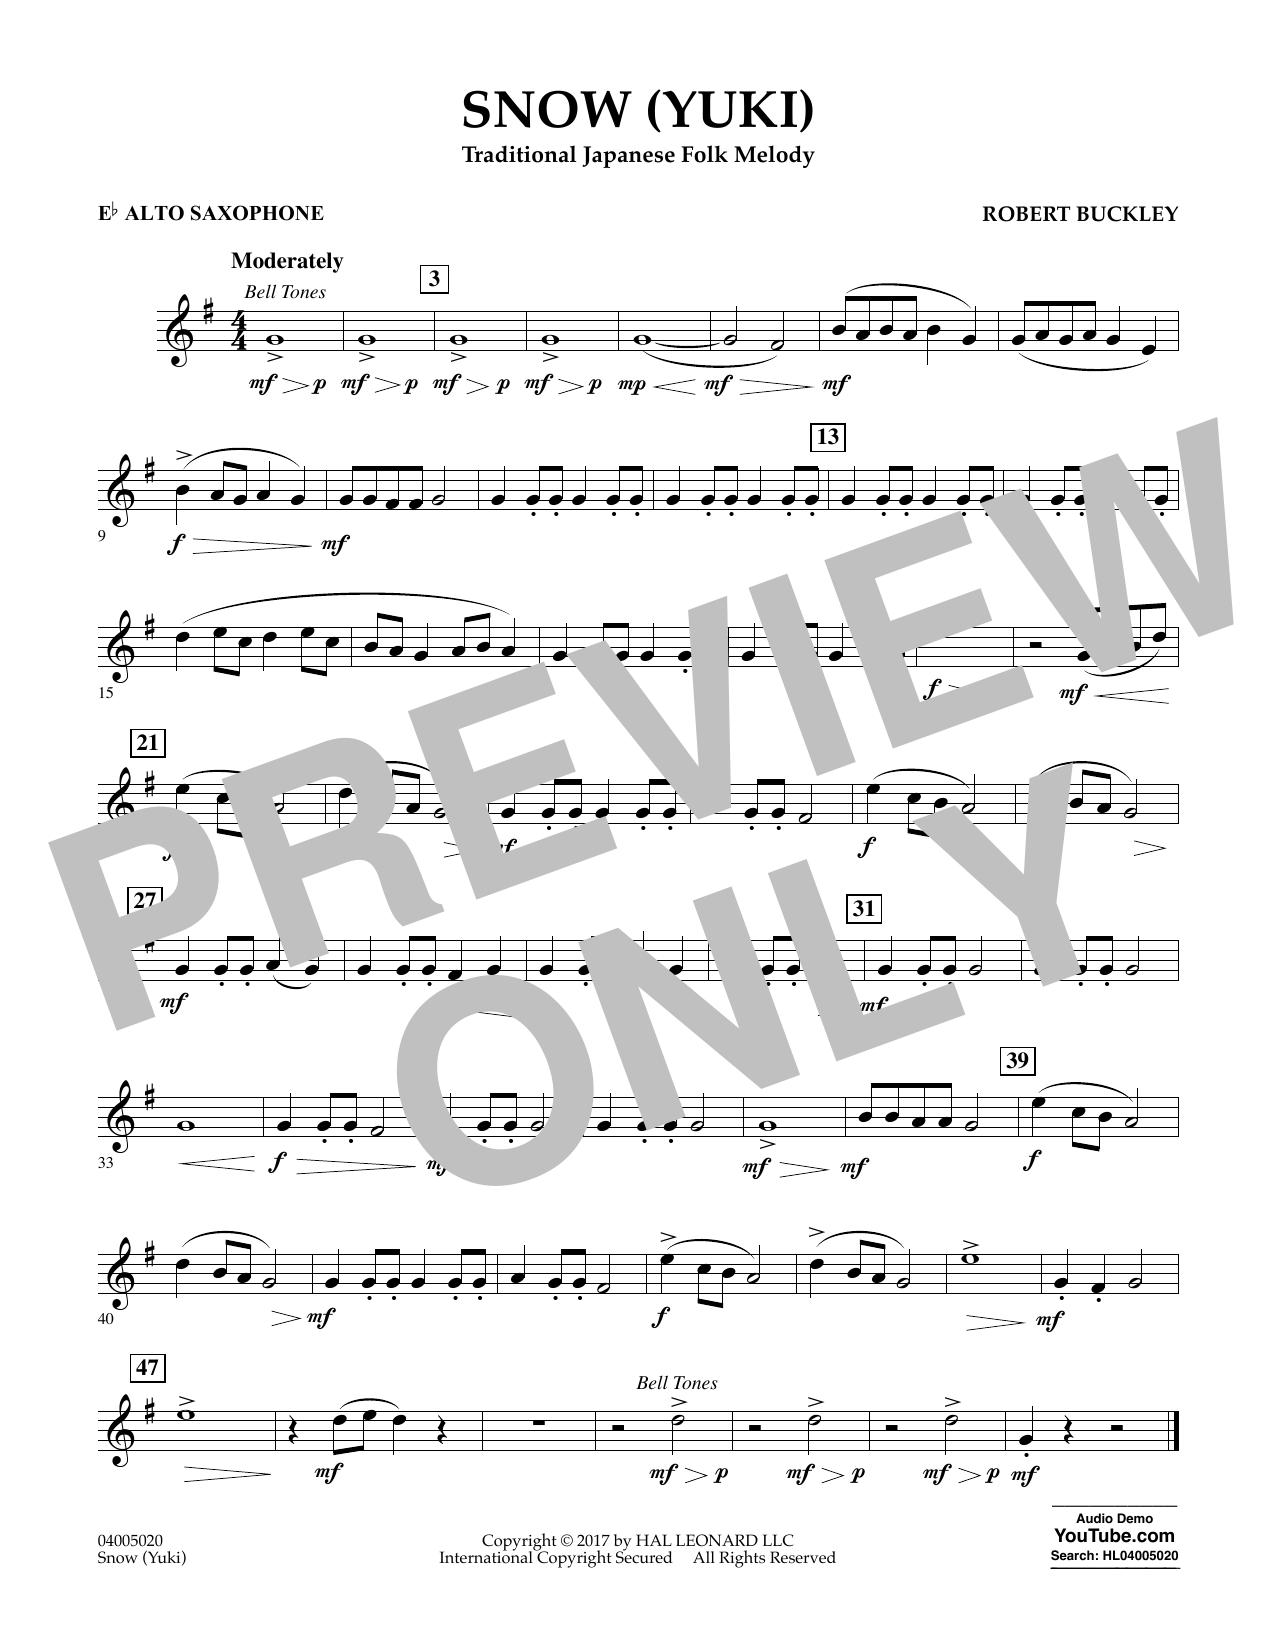 Robert Buckley Snow (Yuki) - Eb Alto Saxophone sheet music notes and chords. Download Printable PDF.